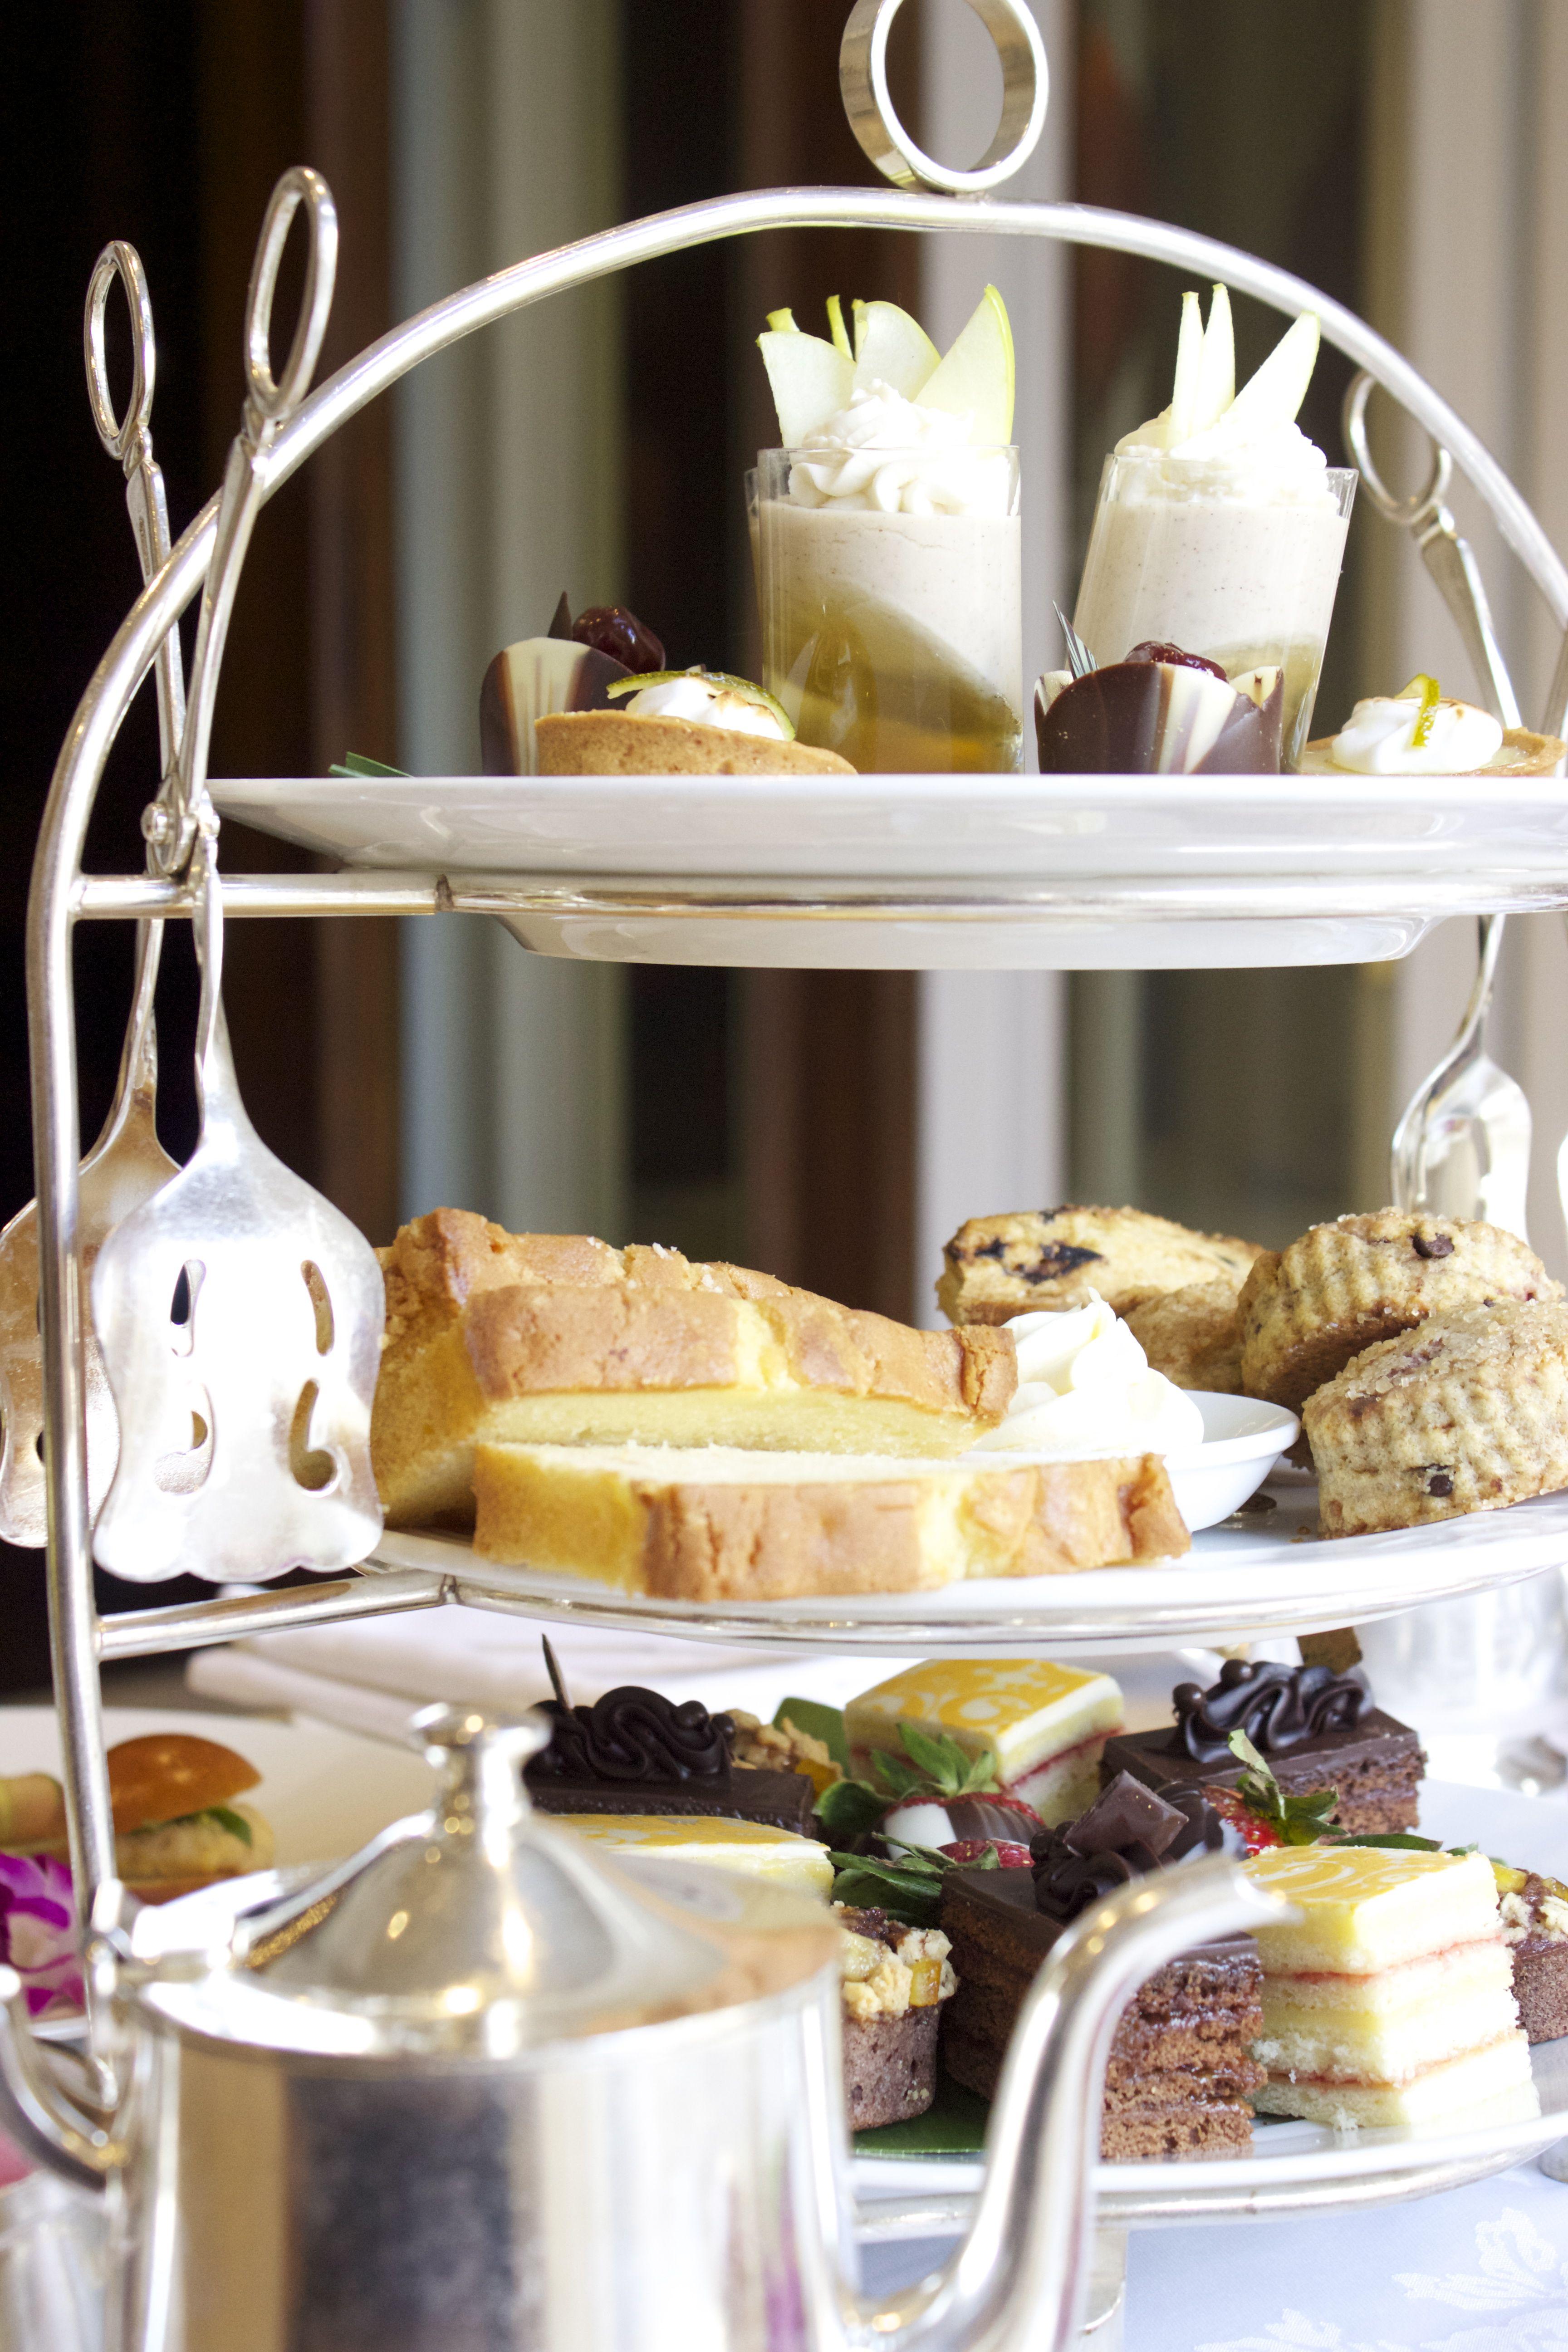 Let's get fancy at Saturday Afternoon Tea A three tier